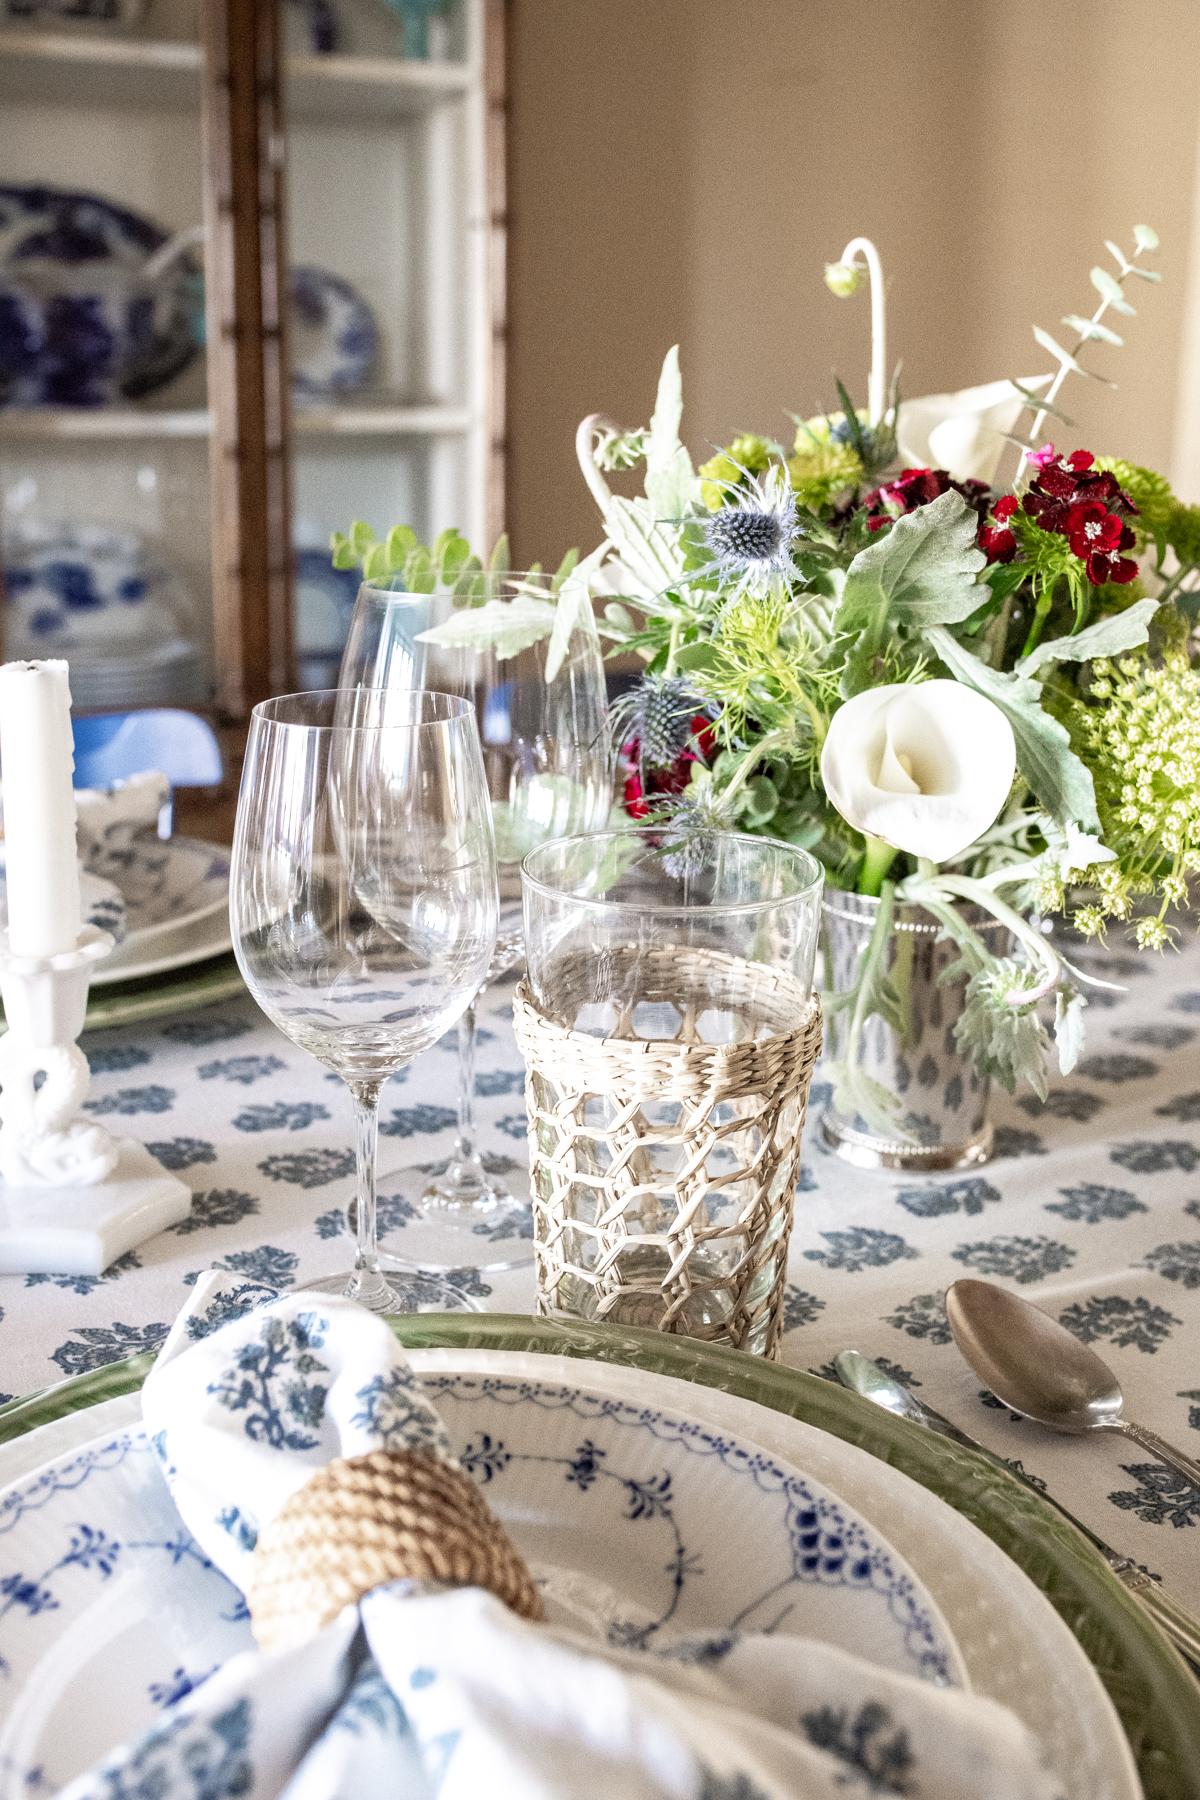 Spring Dinner Party Table x Pottery Barn  x Stacie Flinner-21.jpg